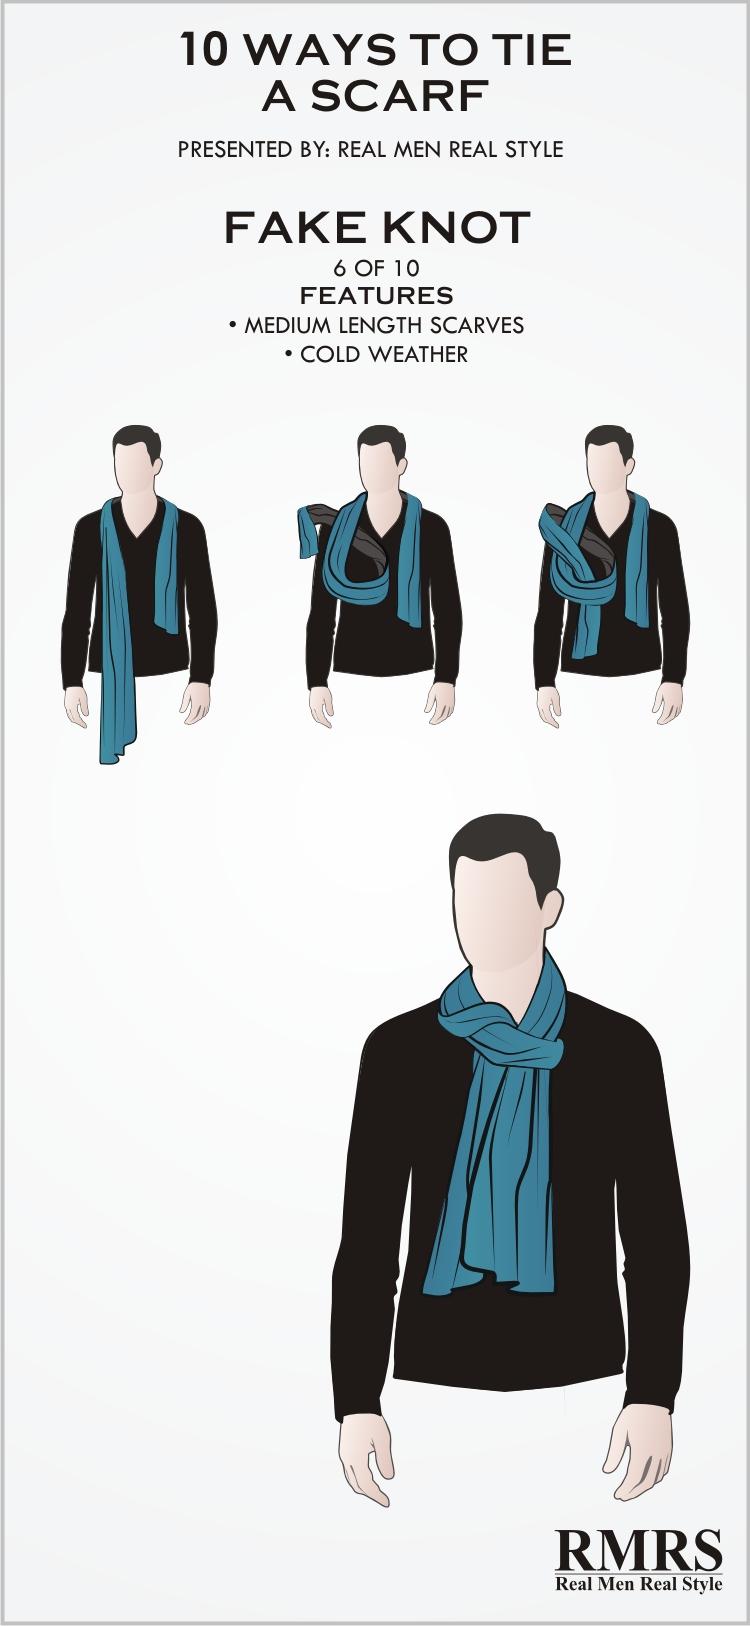 10-ways-to-tie-a-scarf-finall-full-6.jpg